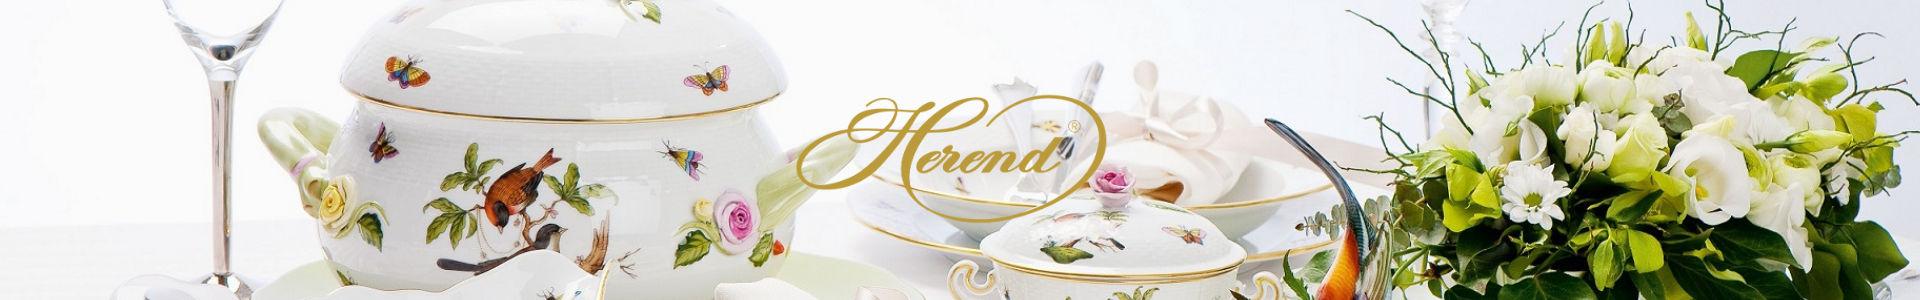 banner herend shop online code discount sale codice sconto